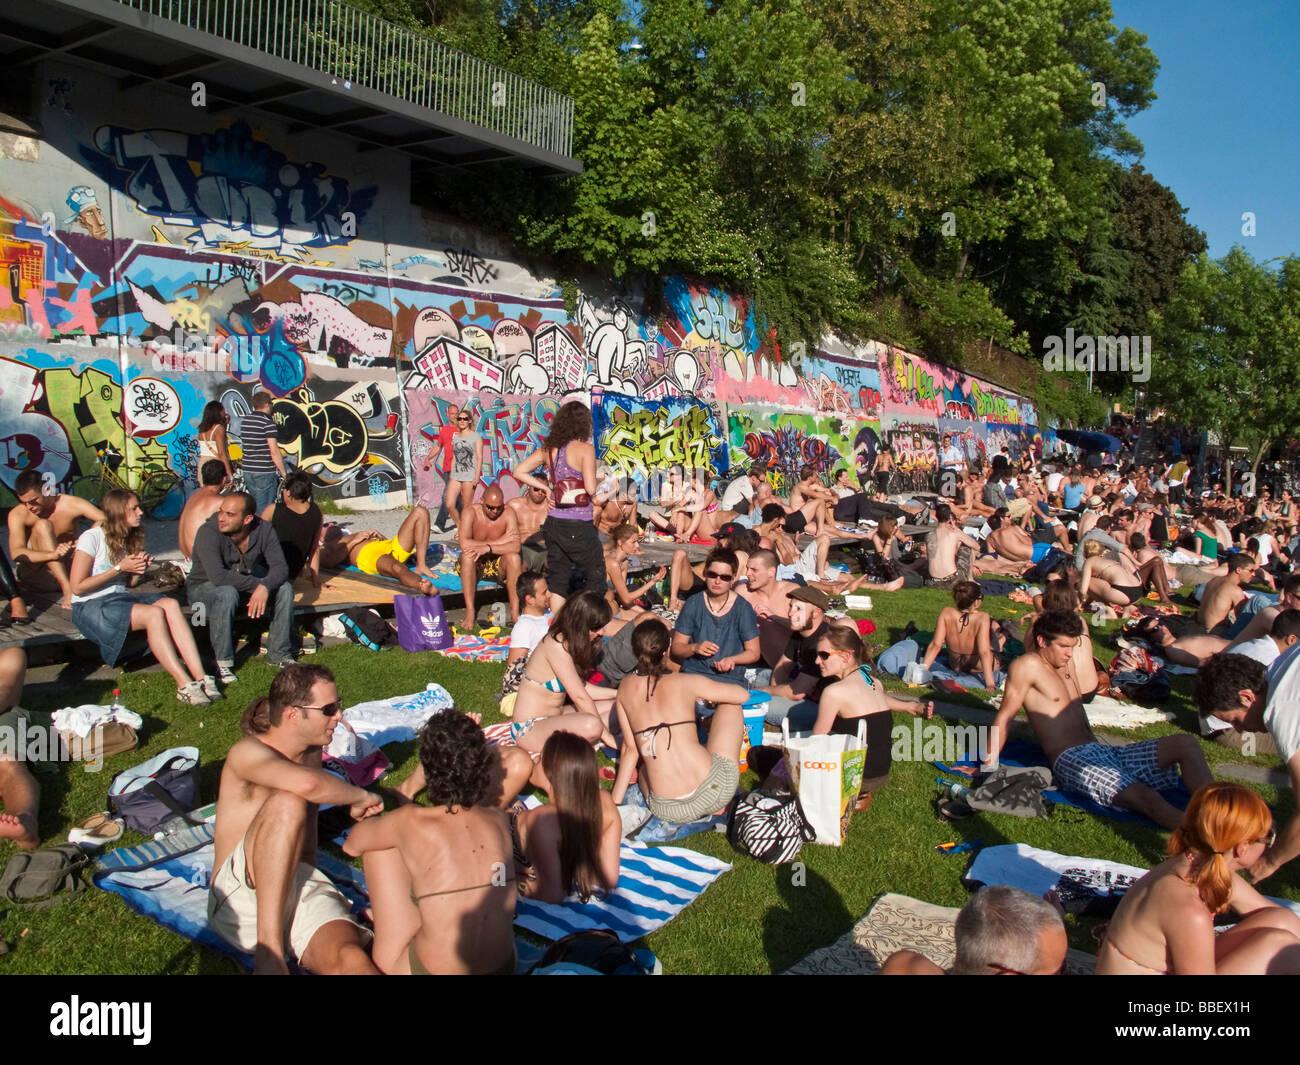 Open air bath Letten at river Limmat people sunbathing Zurich Switzerland. Open air bath Letten at river Limmat people sunbathing Zurich